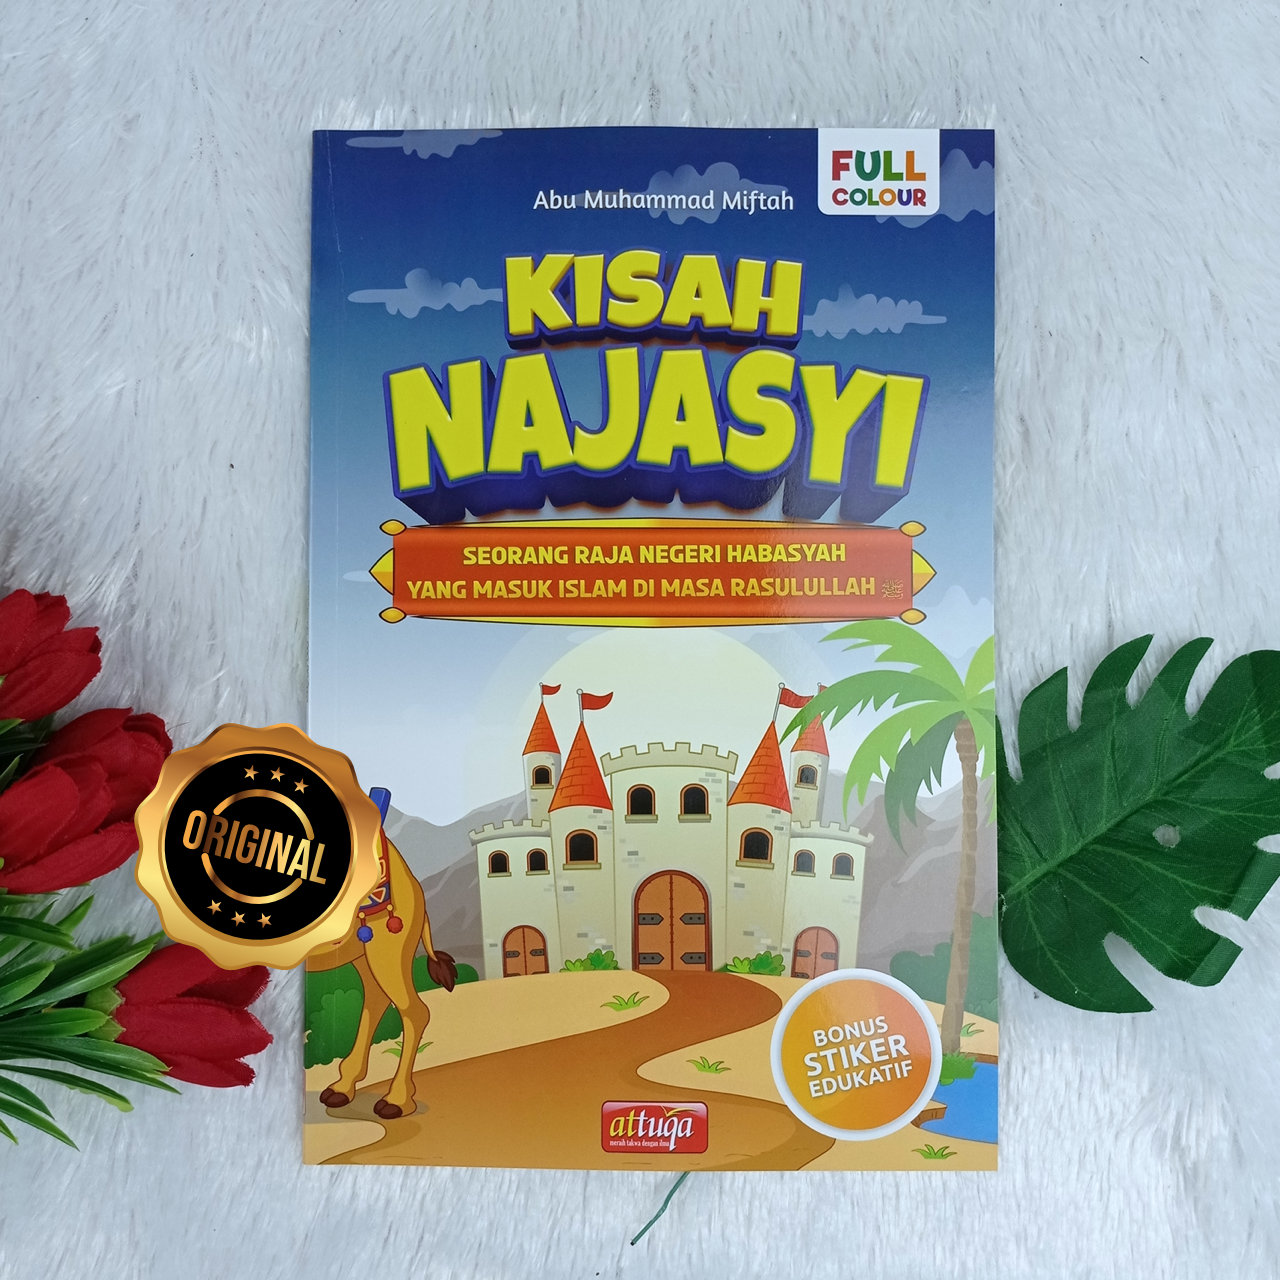 Buku Anak Kisah Najasyi Raja Negeri Habasyah Yang Masuk Islam Di Masa Rasulullah